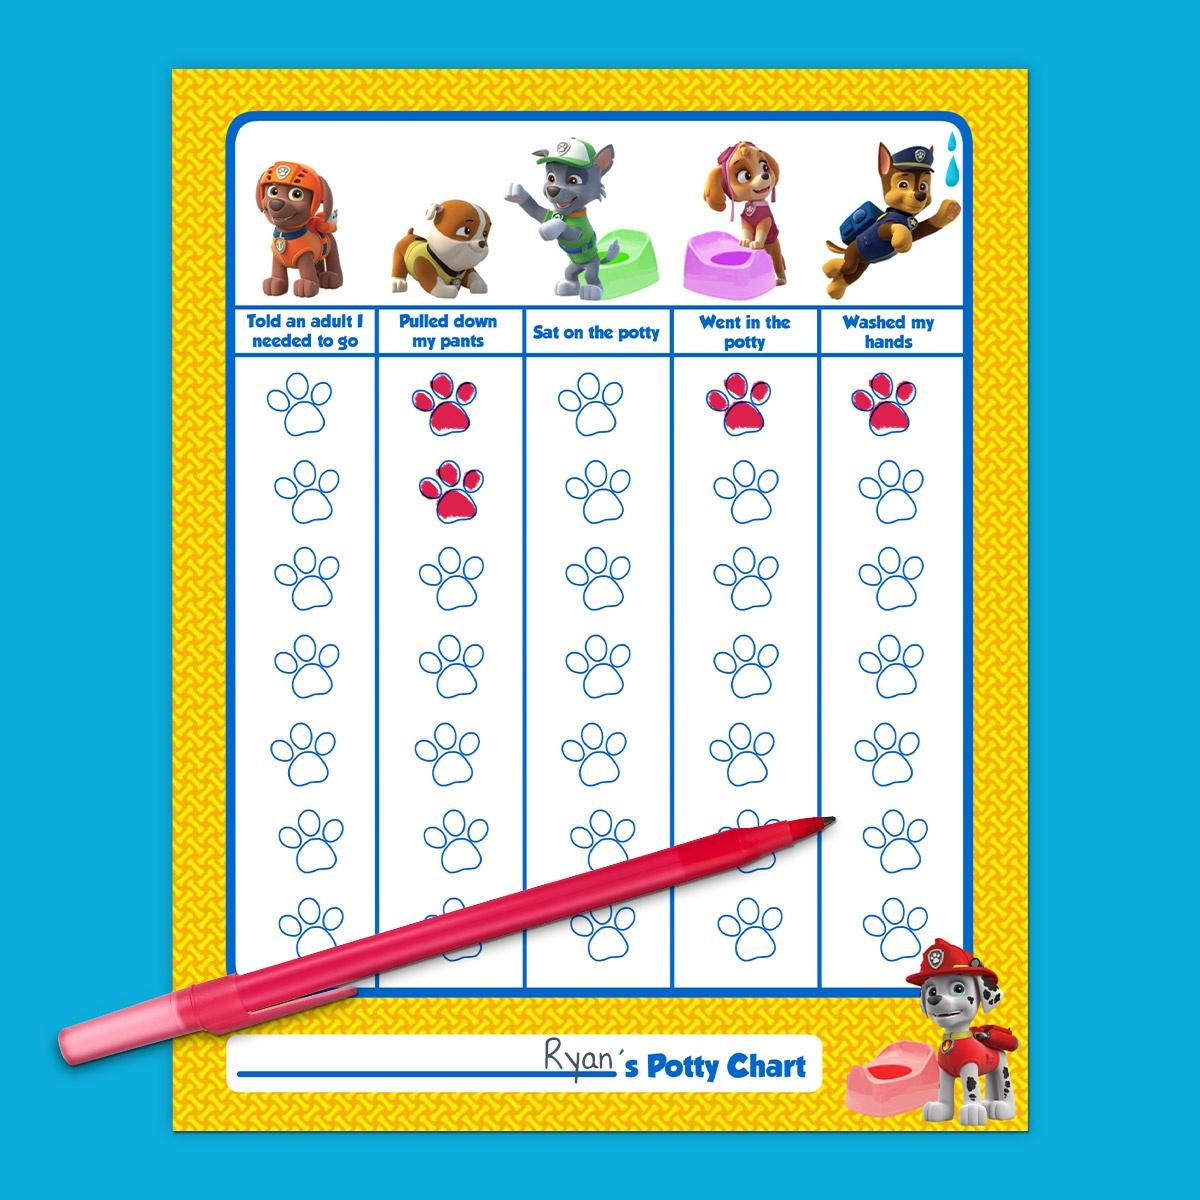 Paw Patrol Potty Training Chart | Nickelodeon Parents - Free Printable Potty Training Charts